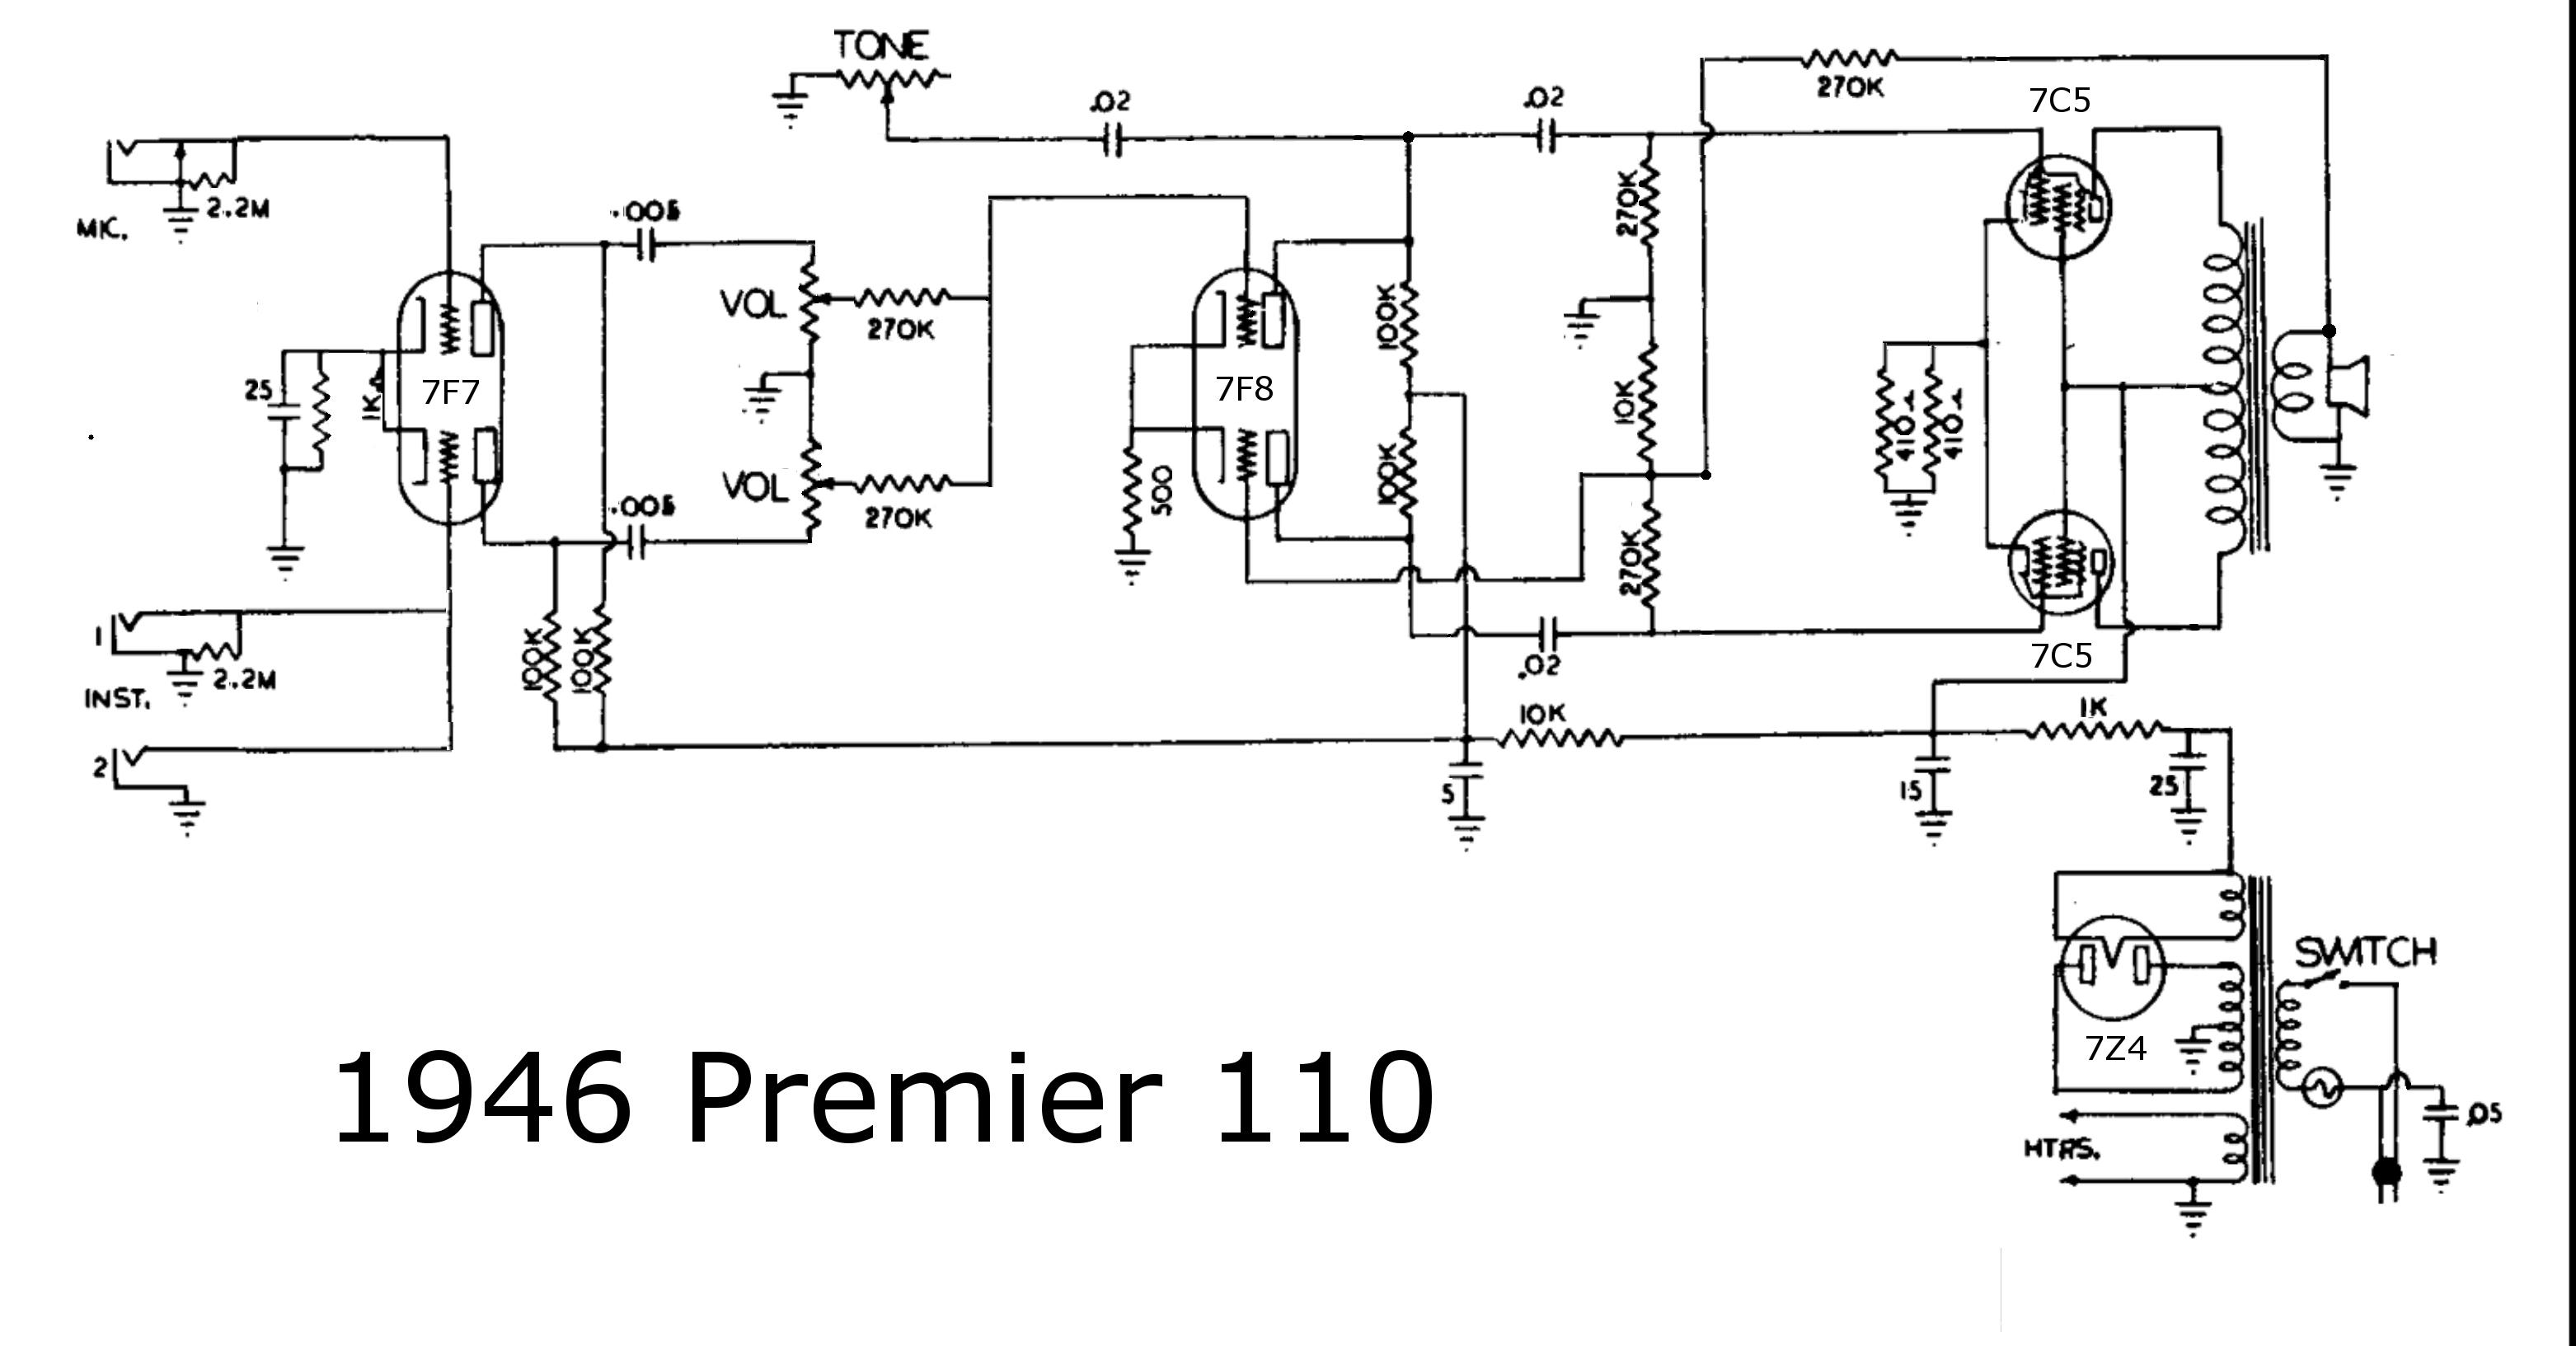 kustom amp schematic prowess amplifiers - misc - schematics - premier 110 - all ...